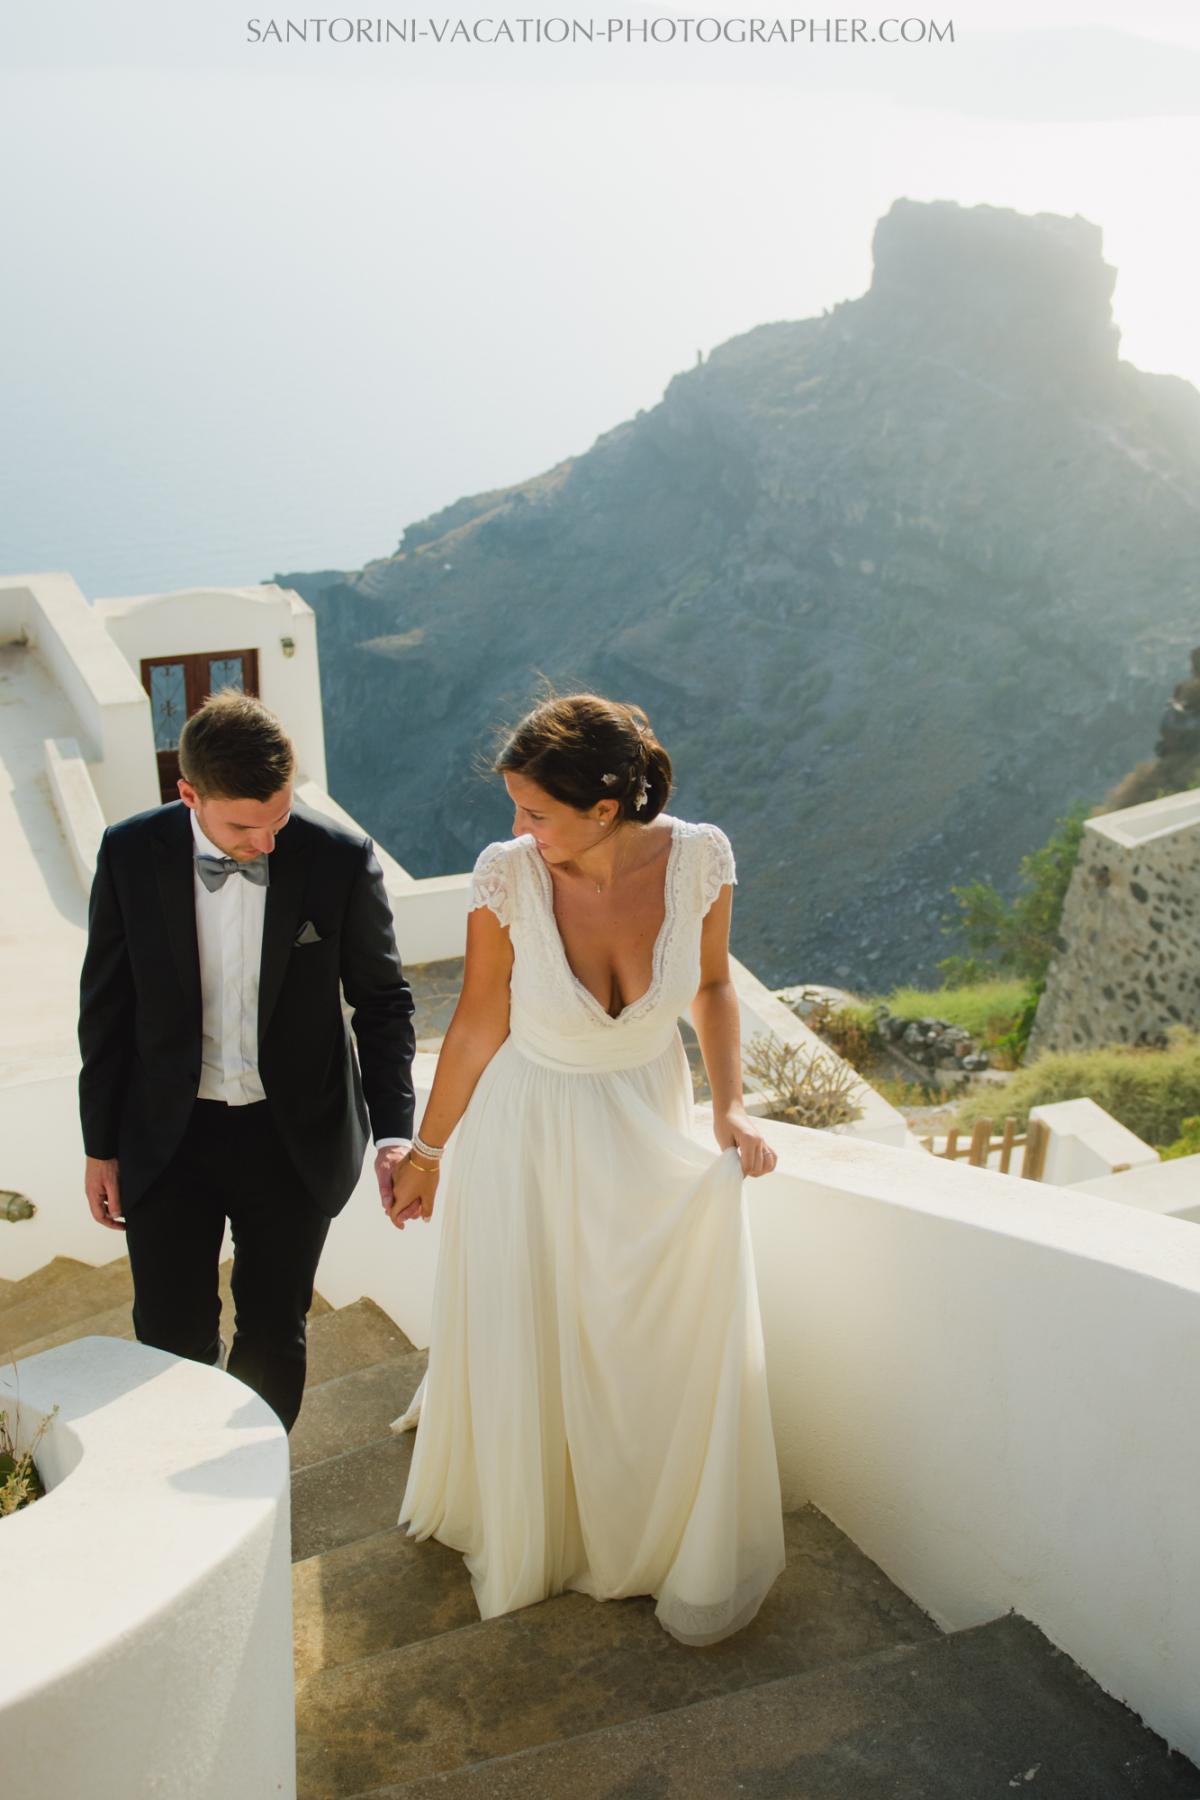 photo-session-santorini-caldera-honeymoon-wedding-dress-4